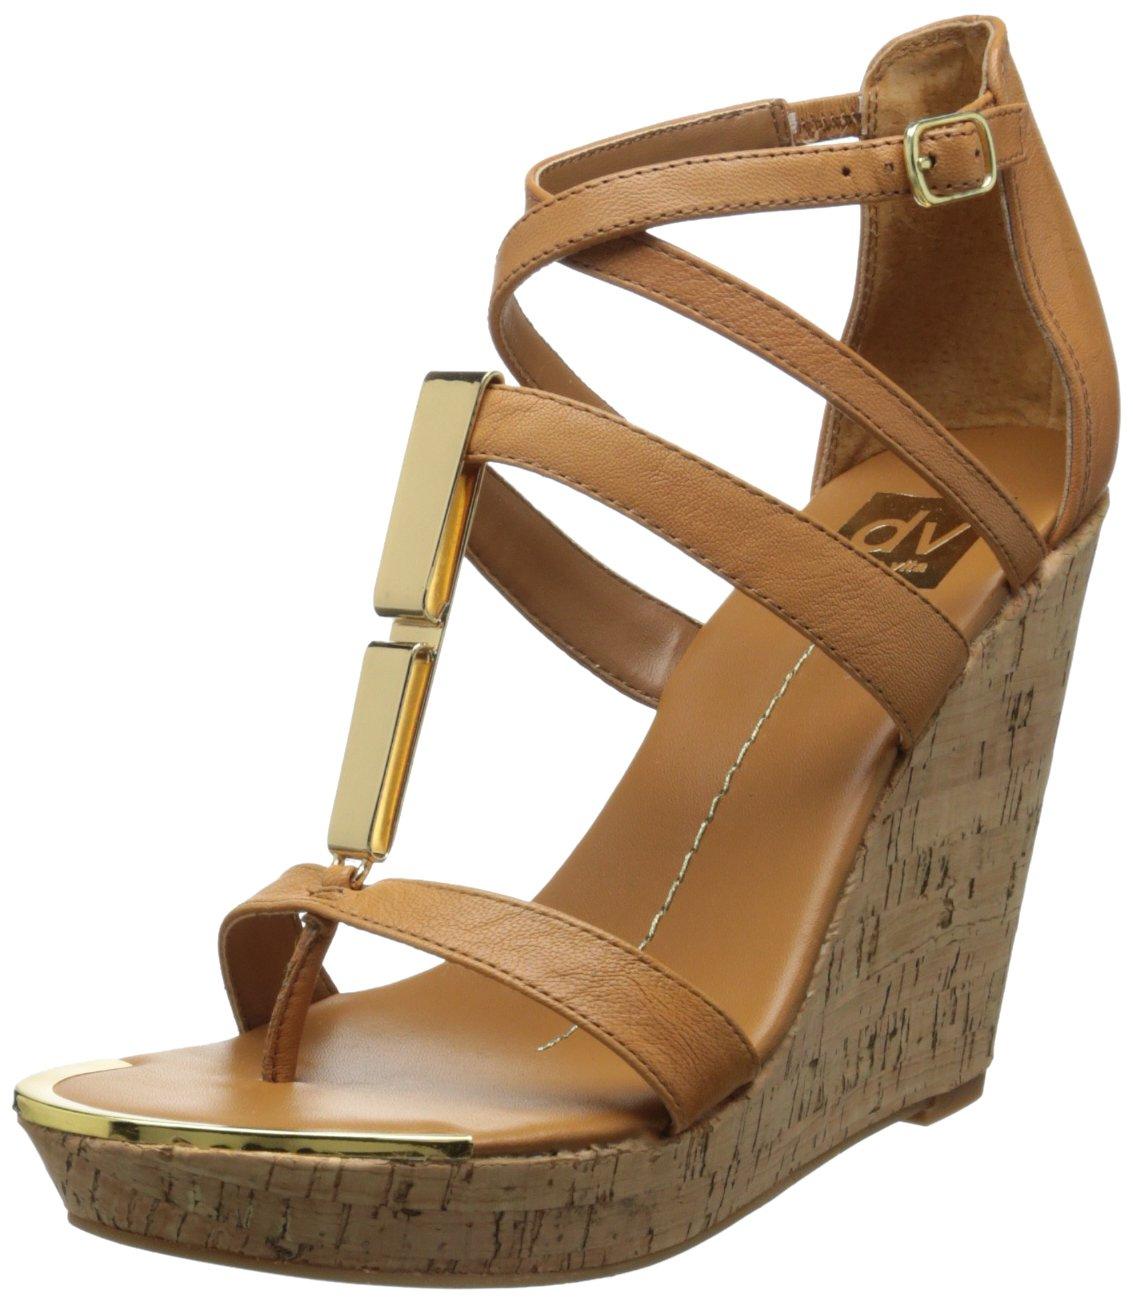 DV by Dolce Vita Women's Tabby Wedge Sandal B00G9AO68W 10 B(M) US|Cognac Stella